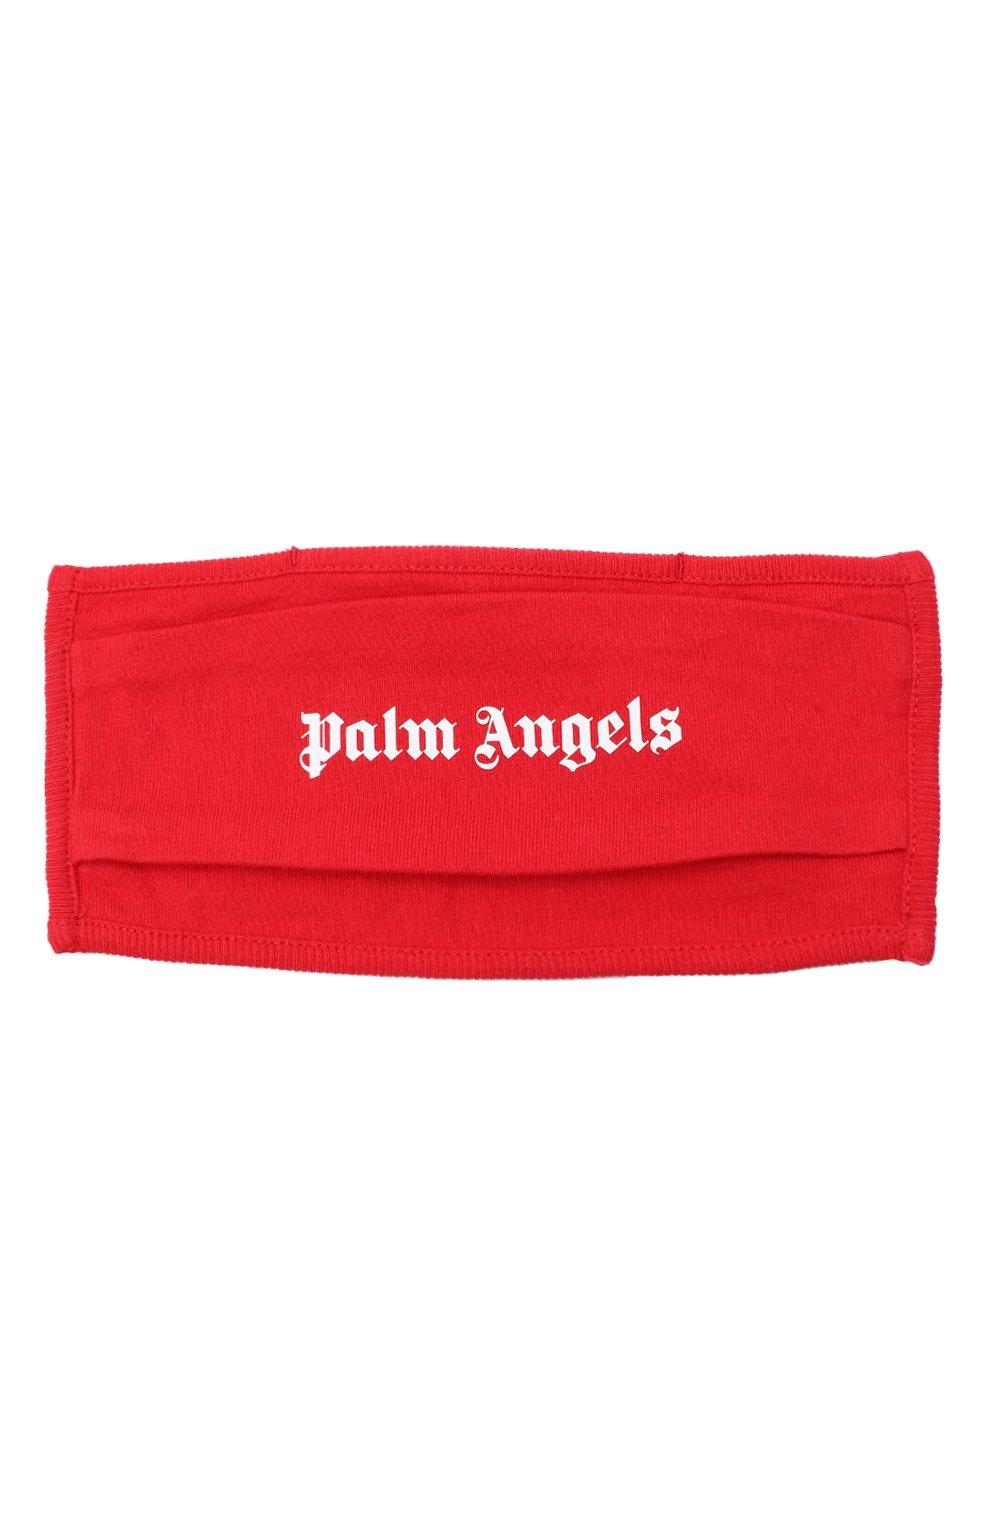 Мужская маска для лица PALM ANGELS красного цвета, арт. PMRG002E20JER0012501   Фото 1